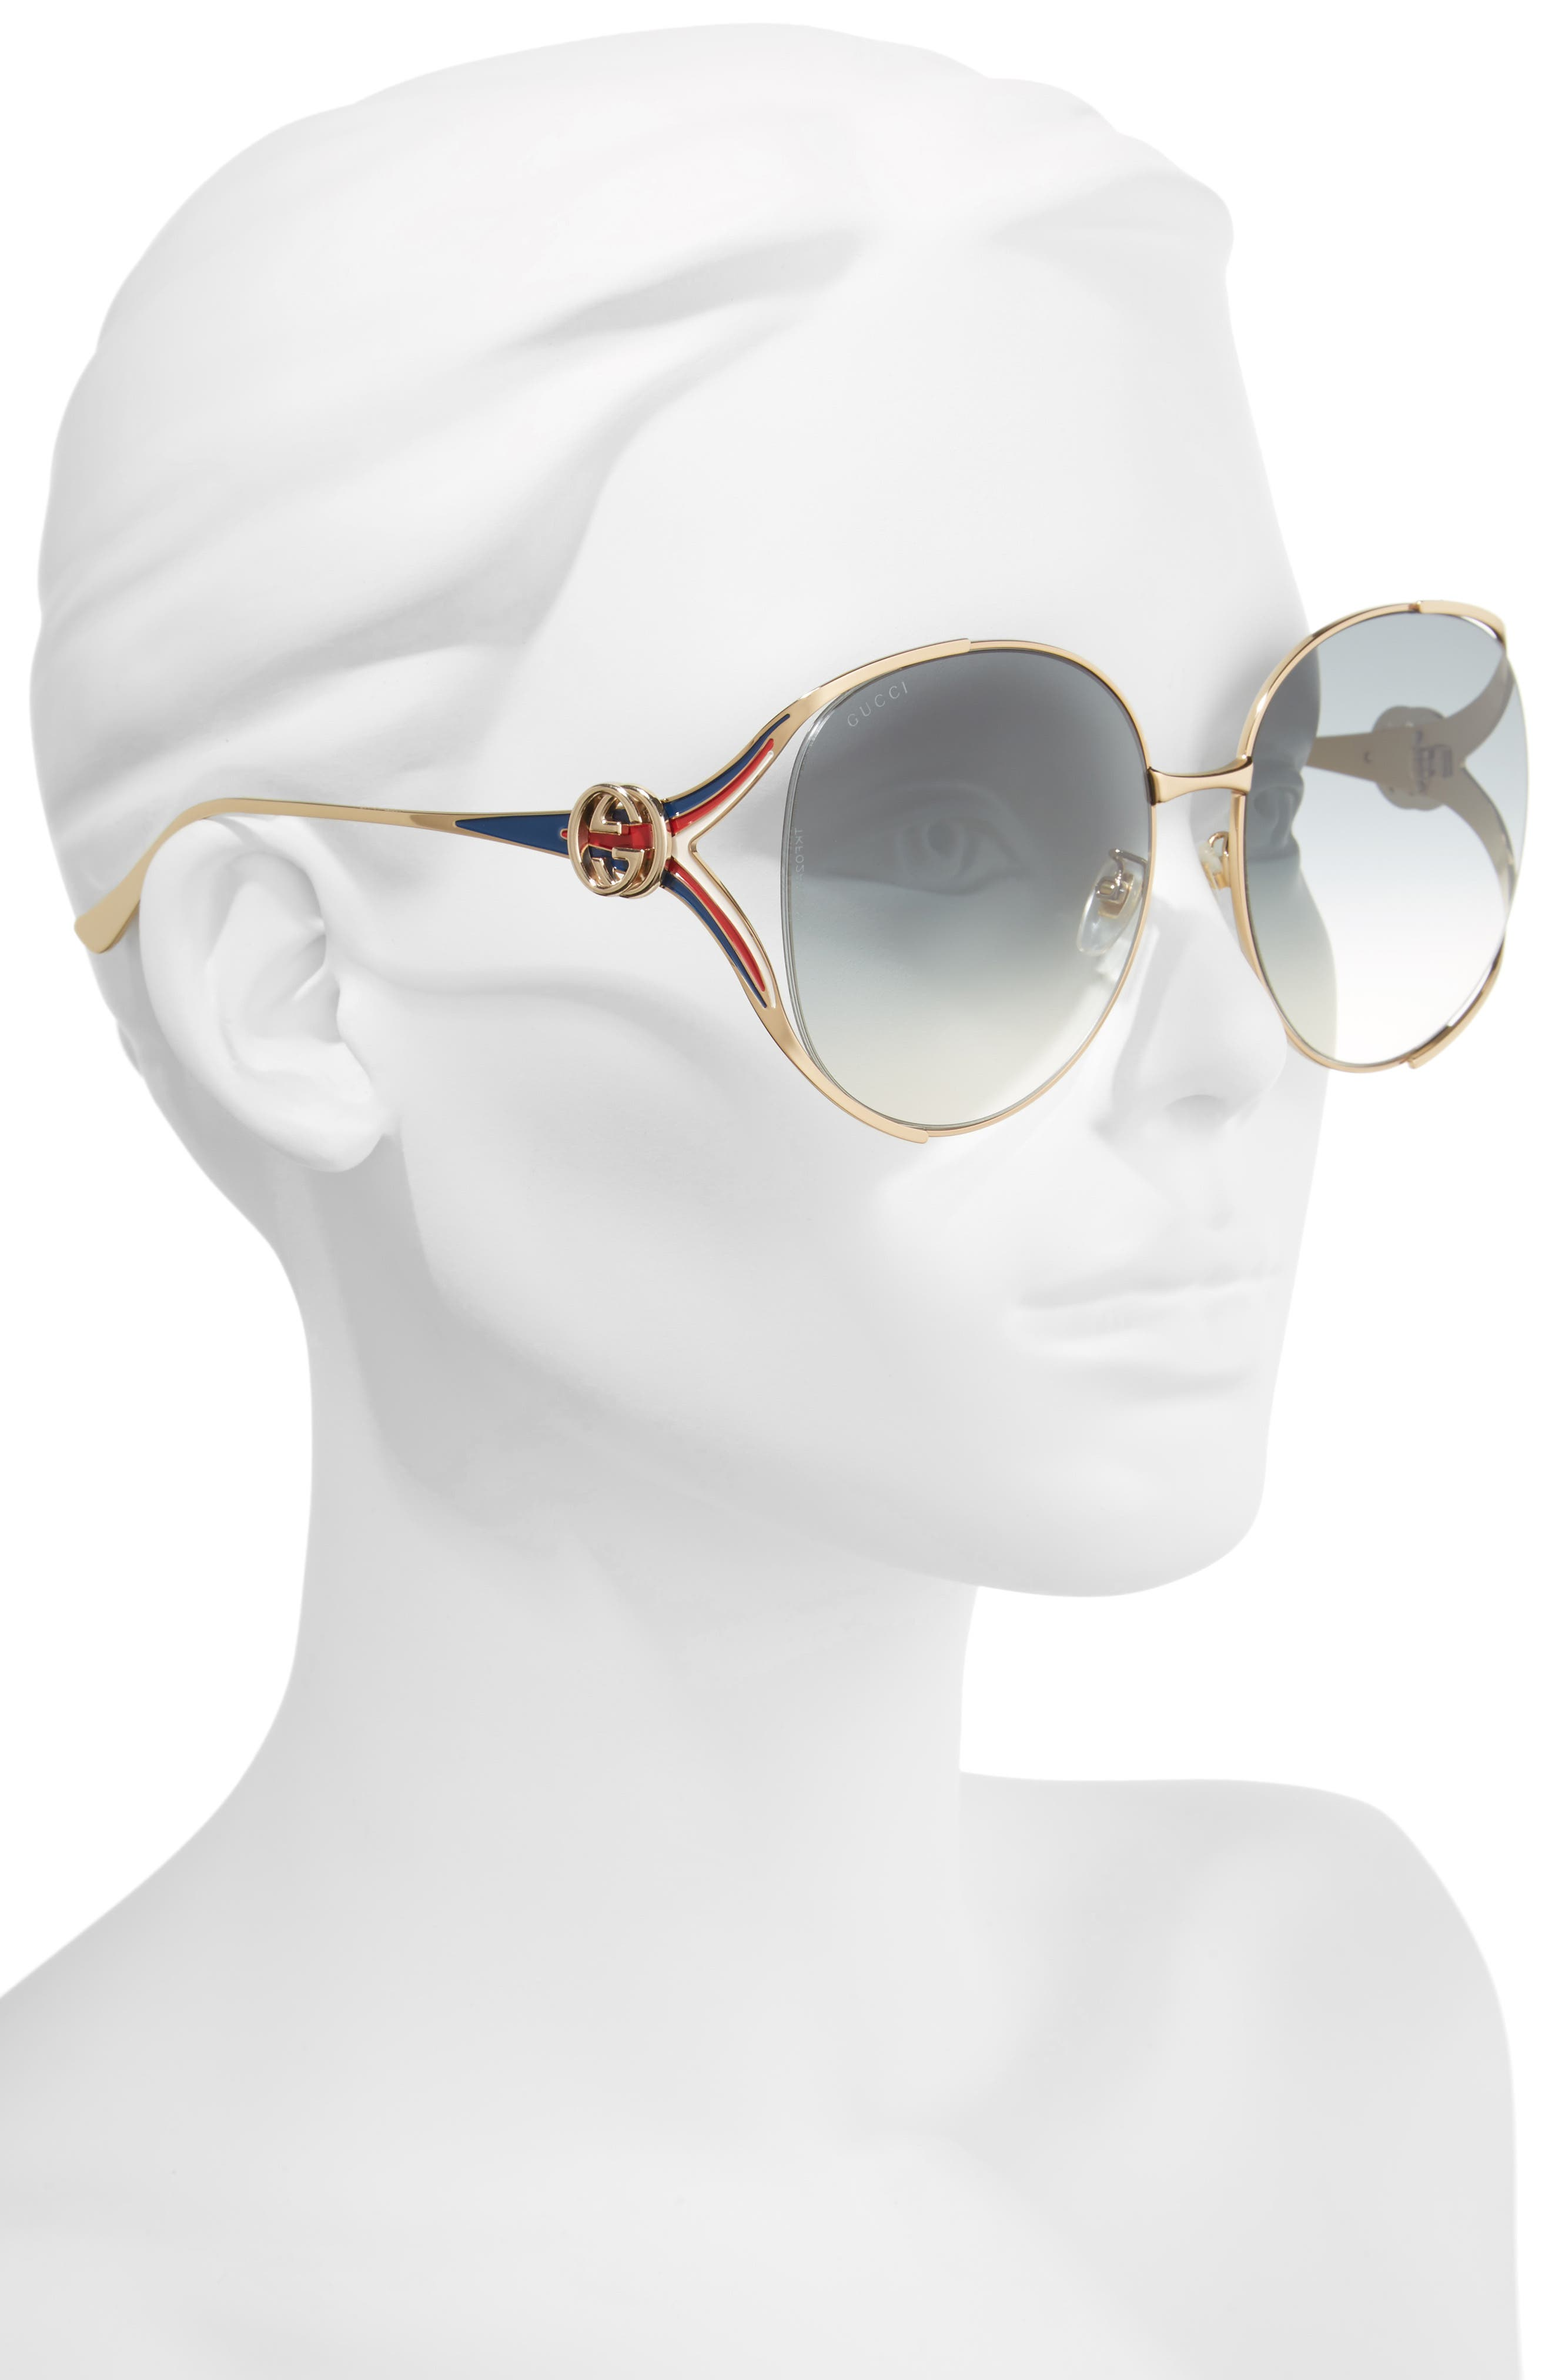 63b01548c24ef Gucci Women s Oversized (60Mm   Above) Sunglasses